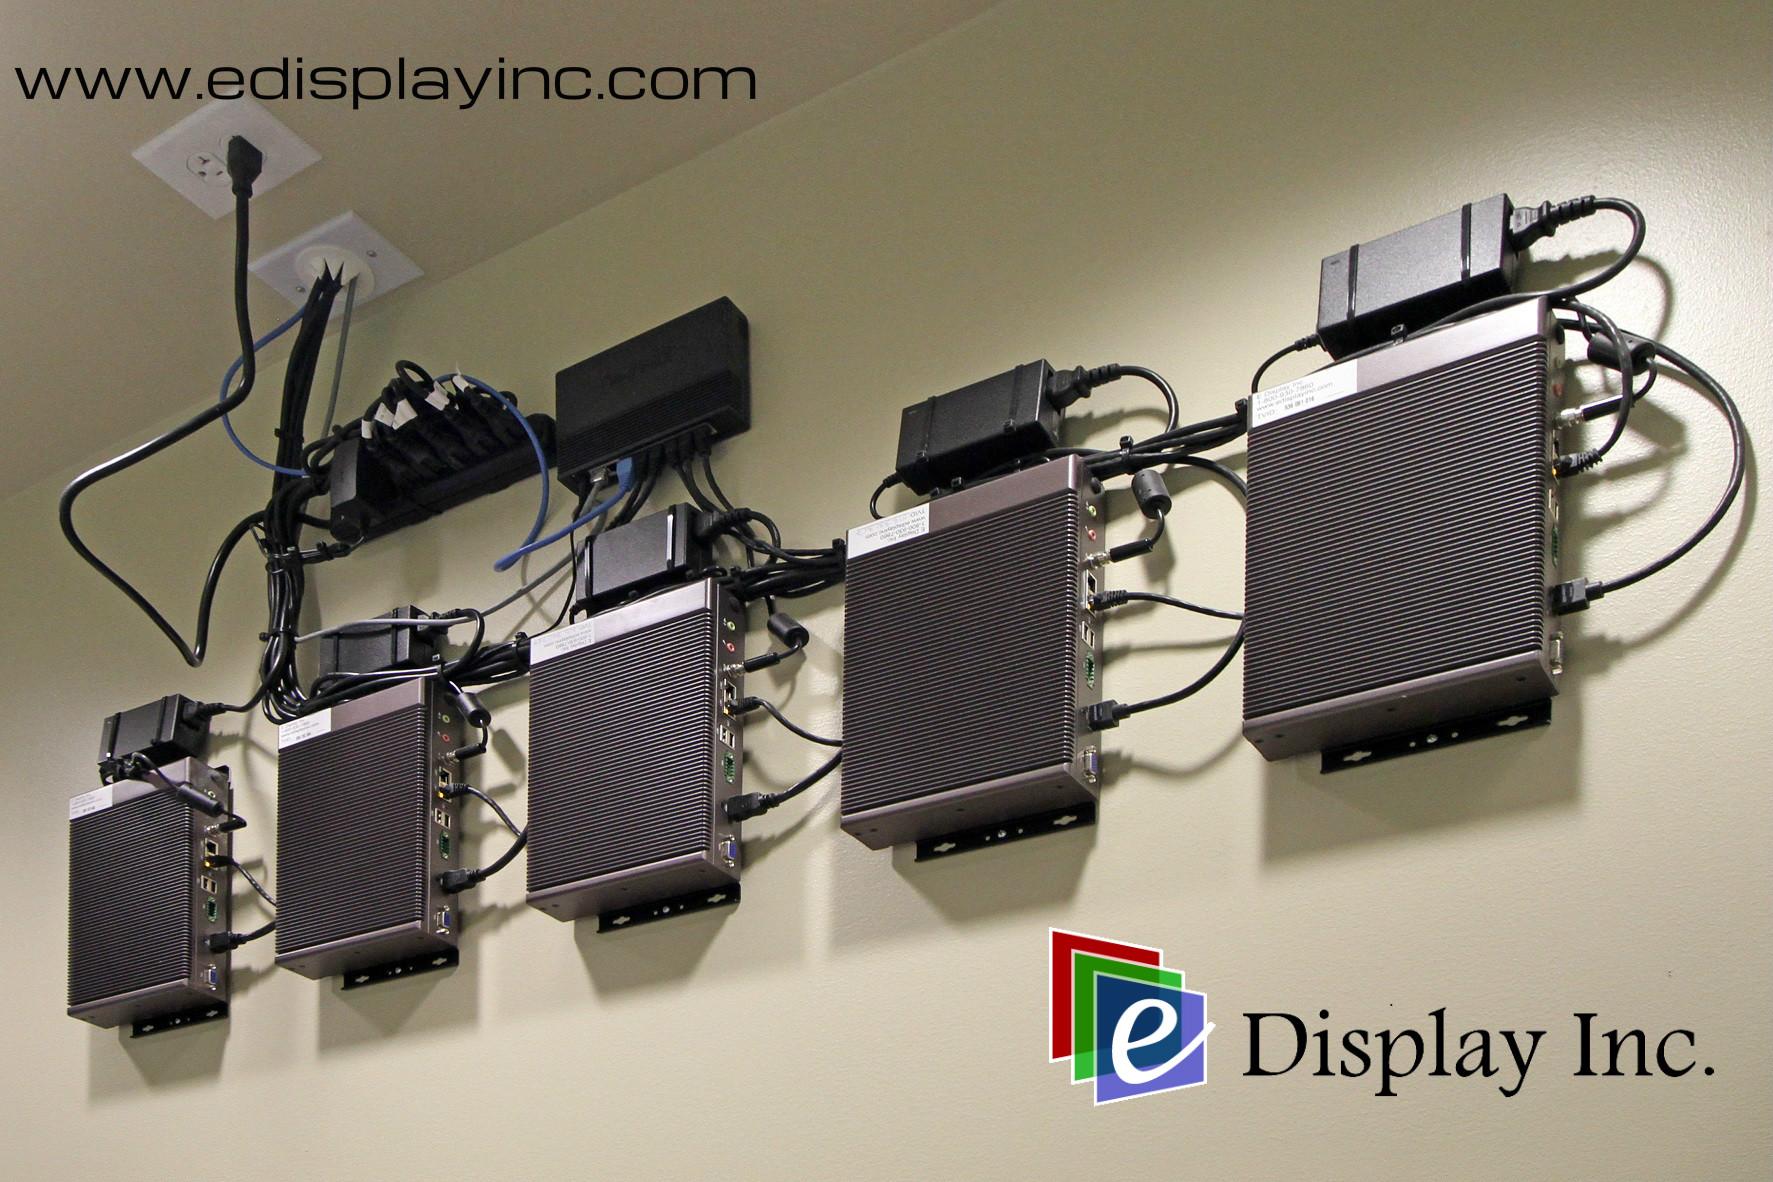 E Display Deploys Digital Menu Boards at Umi Sushi Express in Charlotte Premium Outlets in Charlotte, North Carolina.